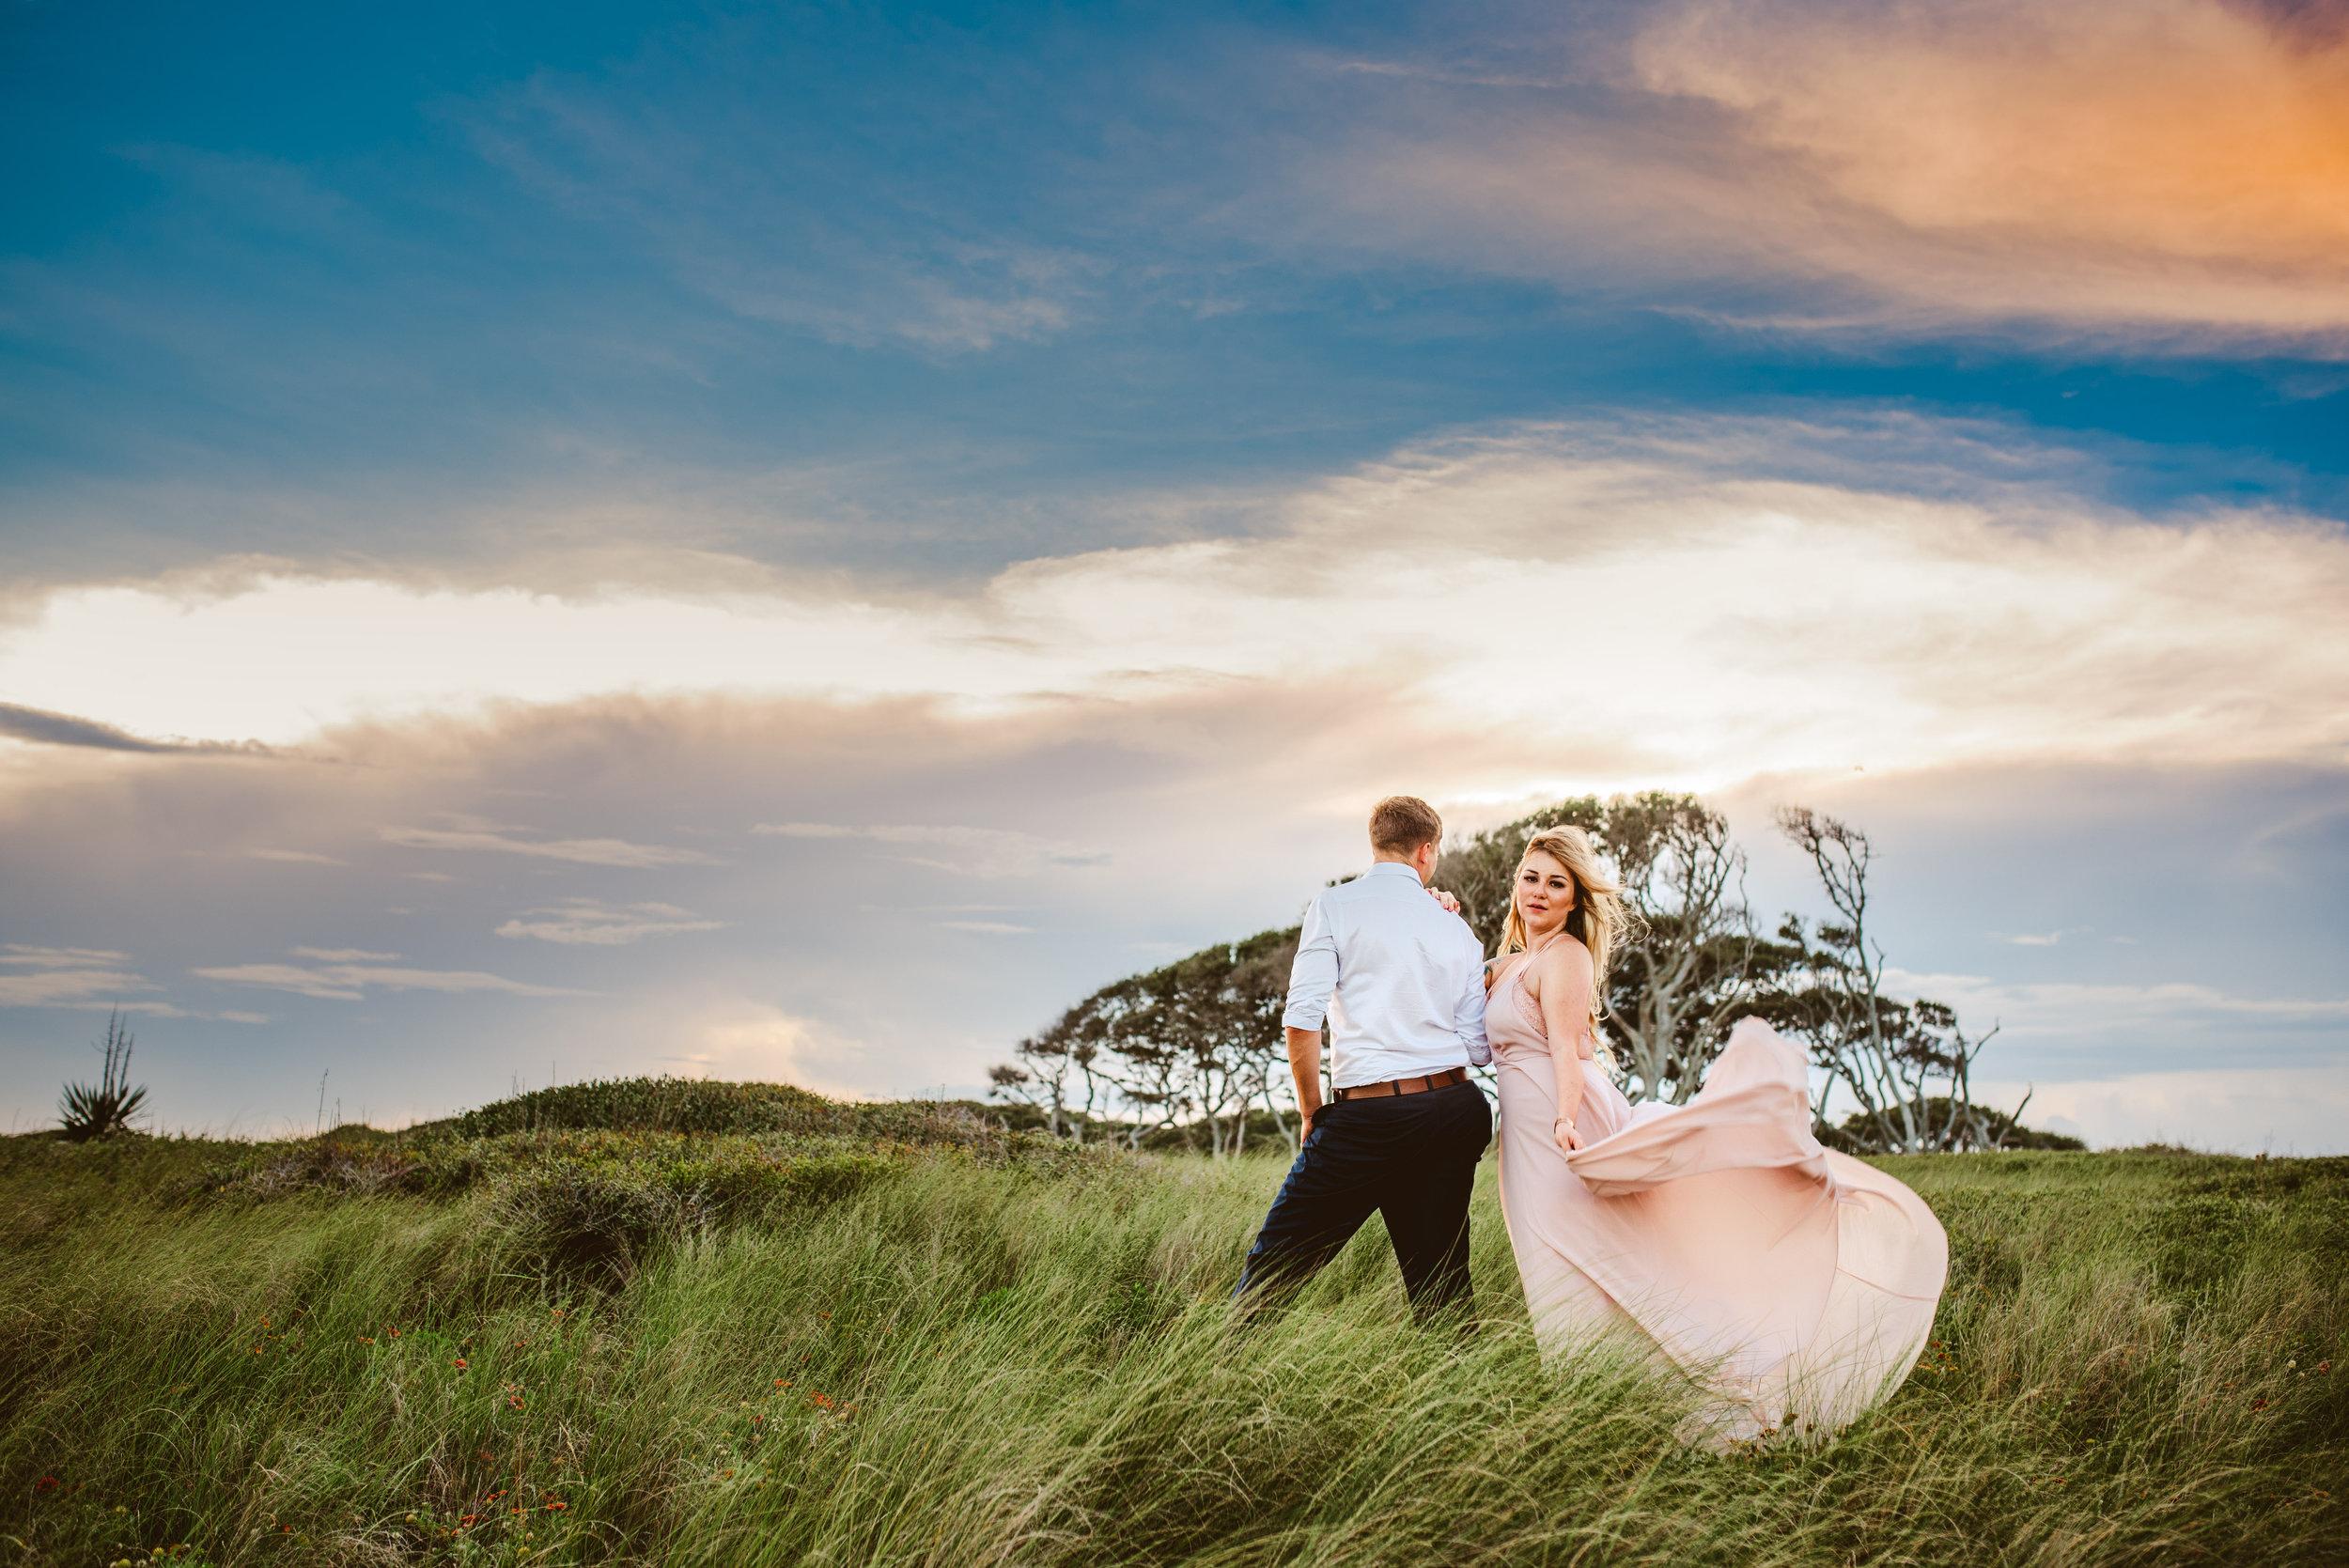 Matt + Johanna - Beach Engagement Photography at Fort Fisher, North Carolina